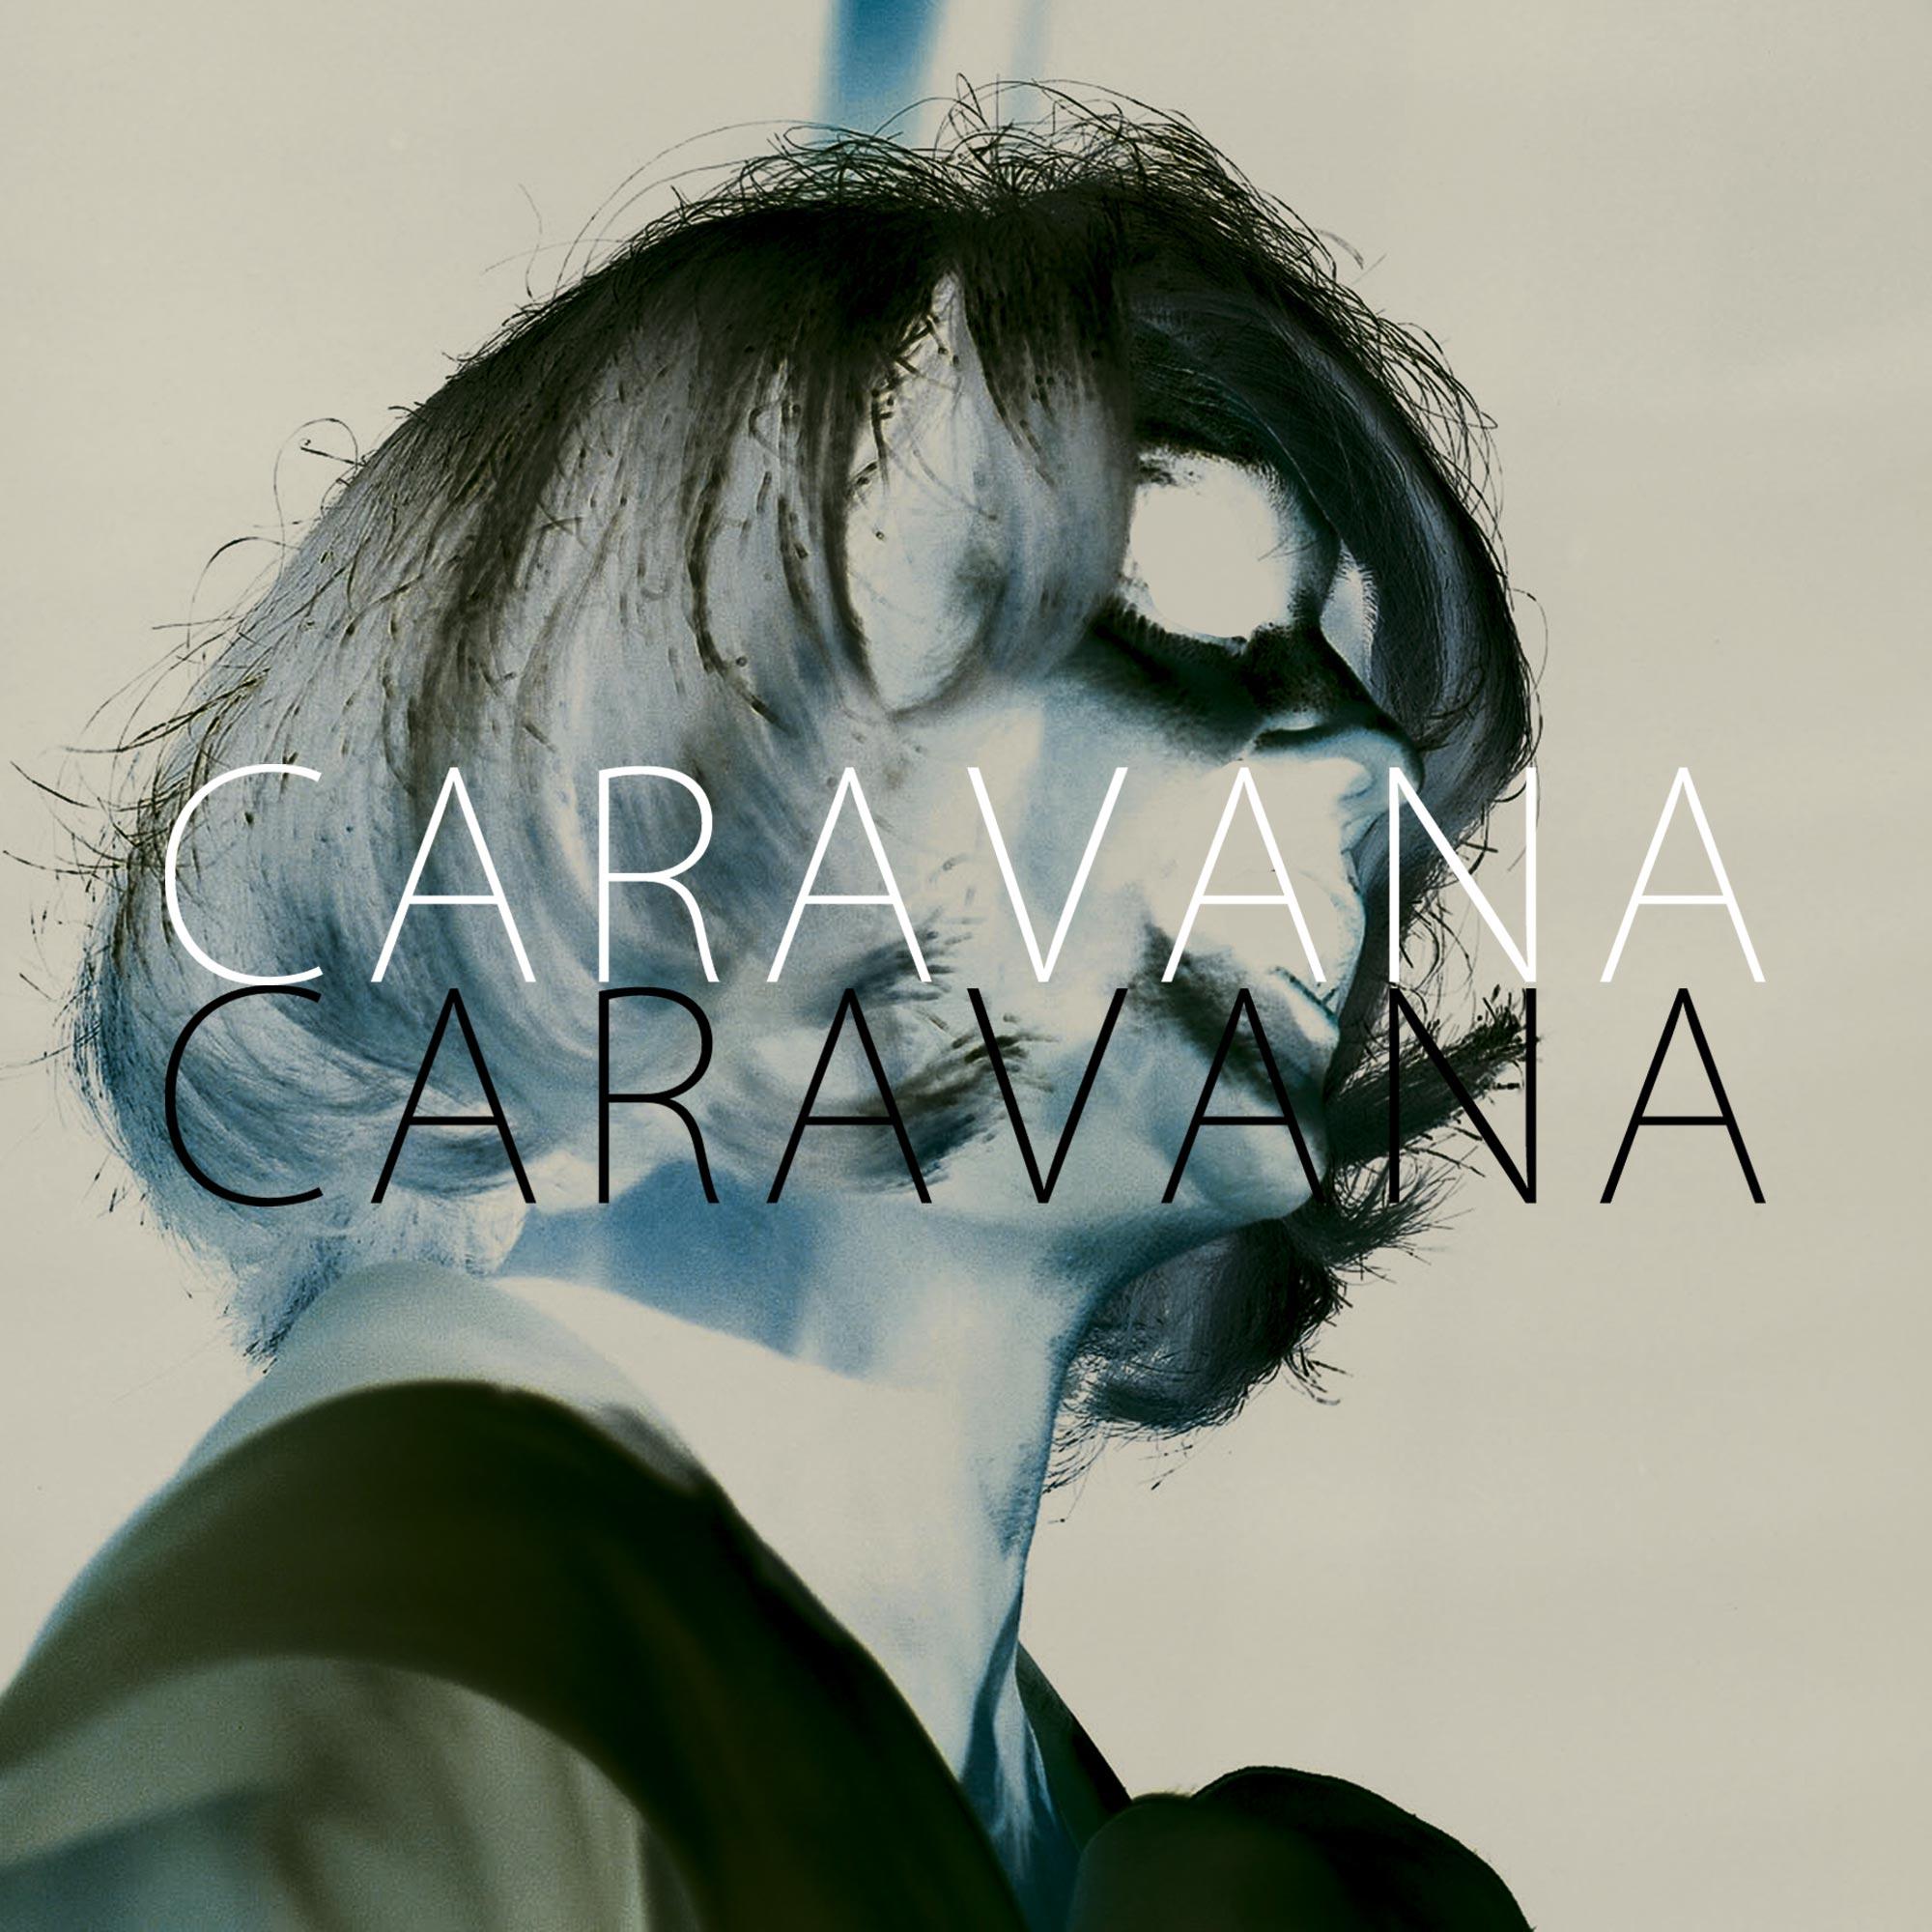 Caravana - Caravana (Vinilo)